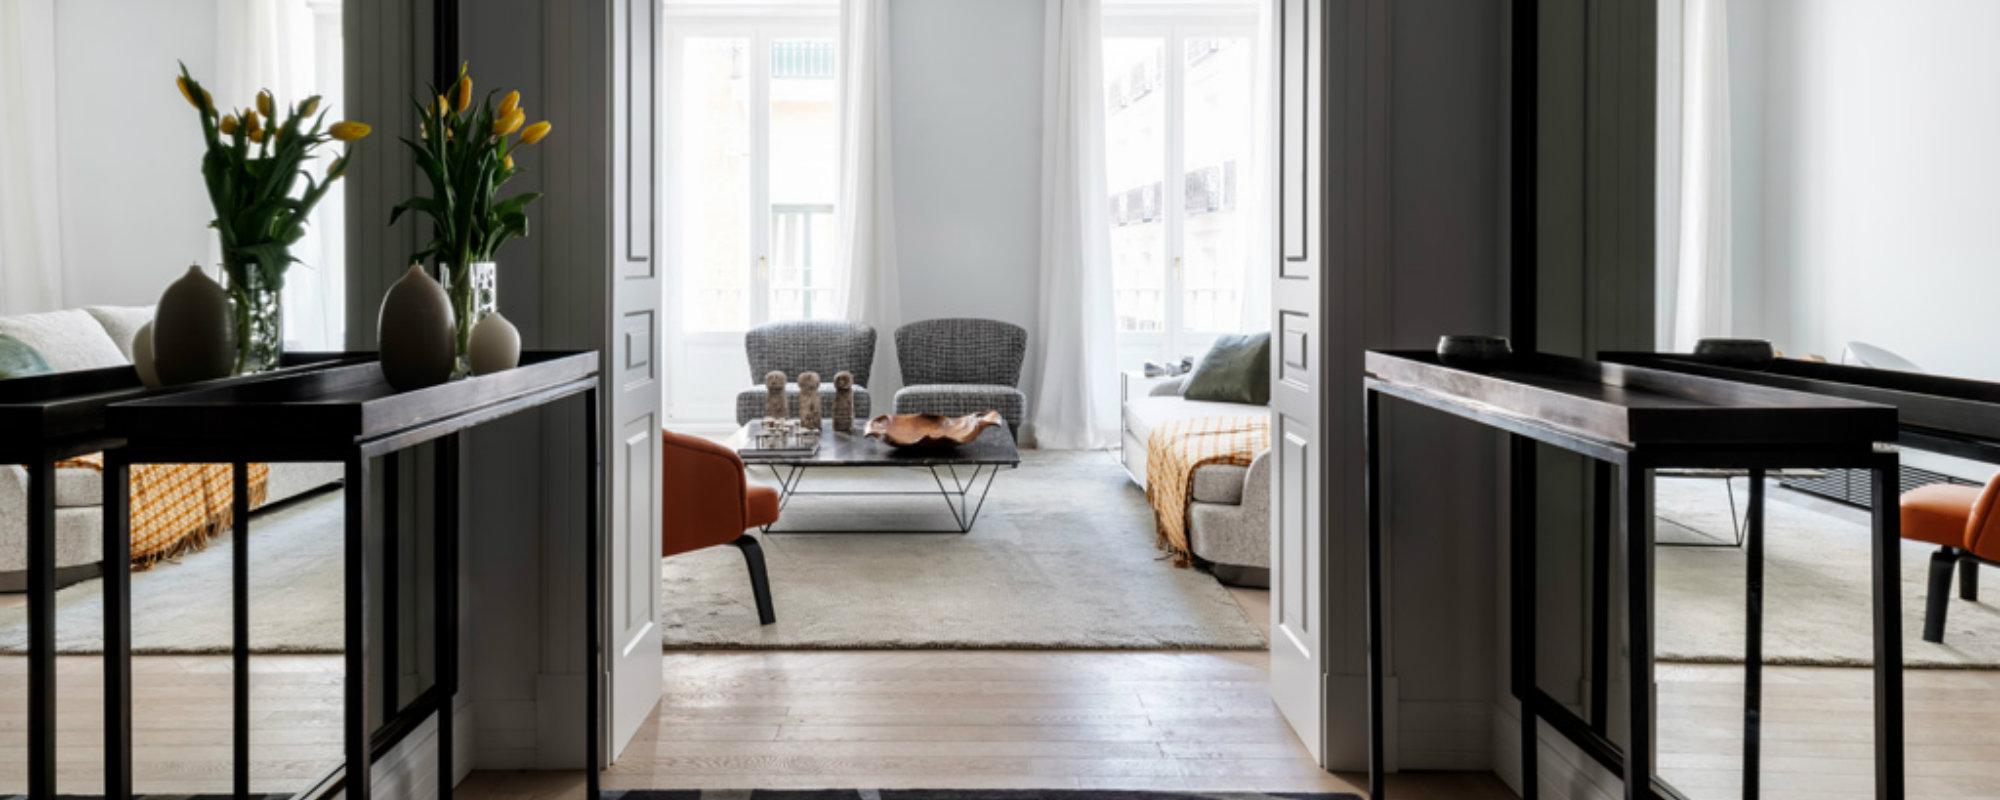 Estudio Ventura: Diseño de interiores poderoso y lujuoso en Madrid estudio ventura Estudio Ventura: Diseño de interiores poderoso y lujuoso en Madrid Featured 1